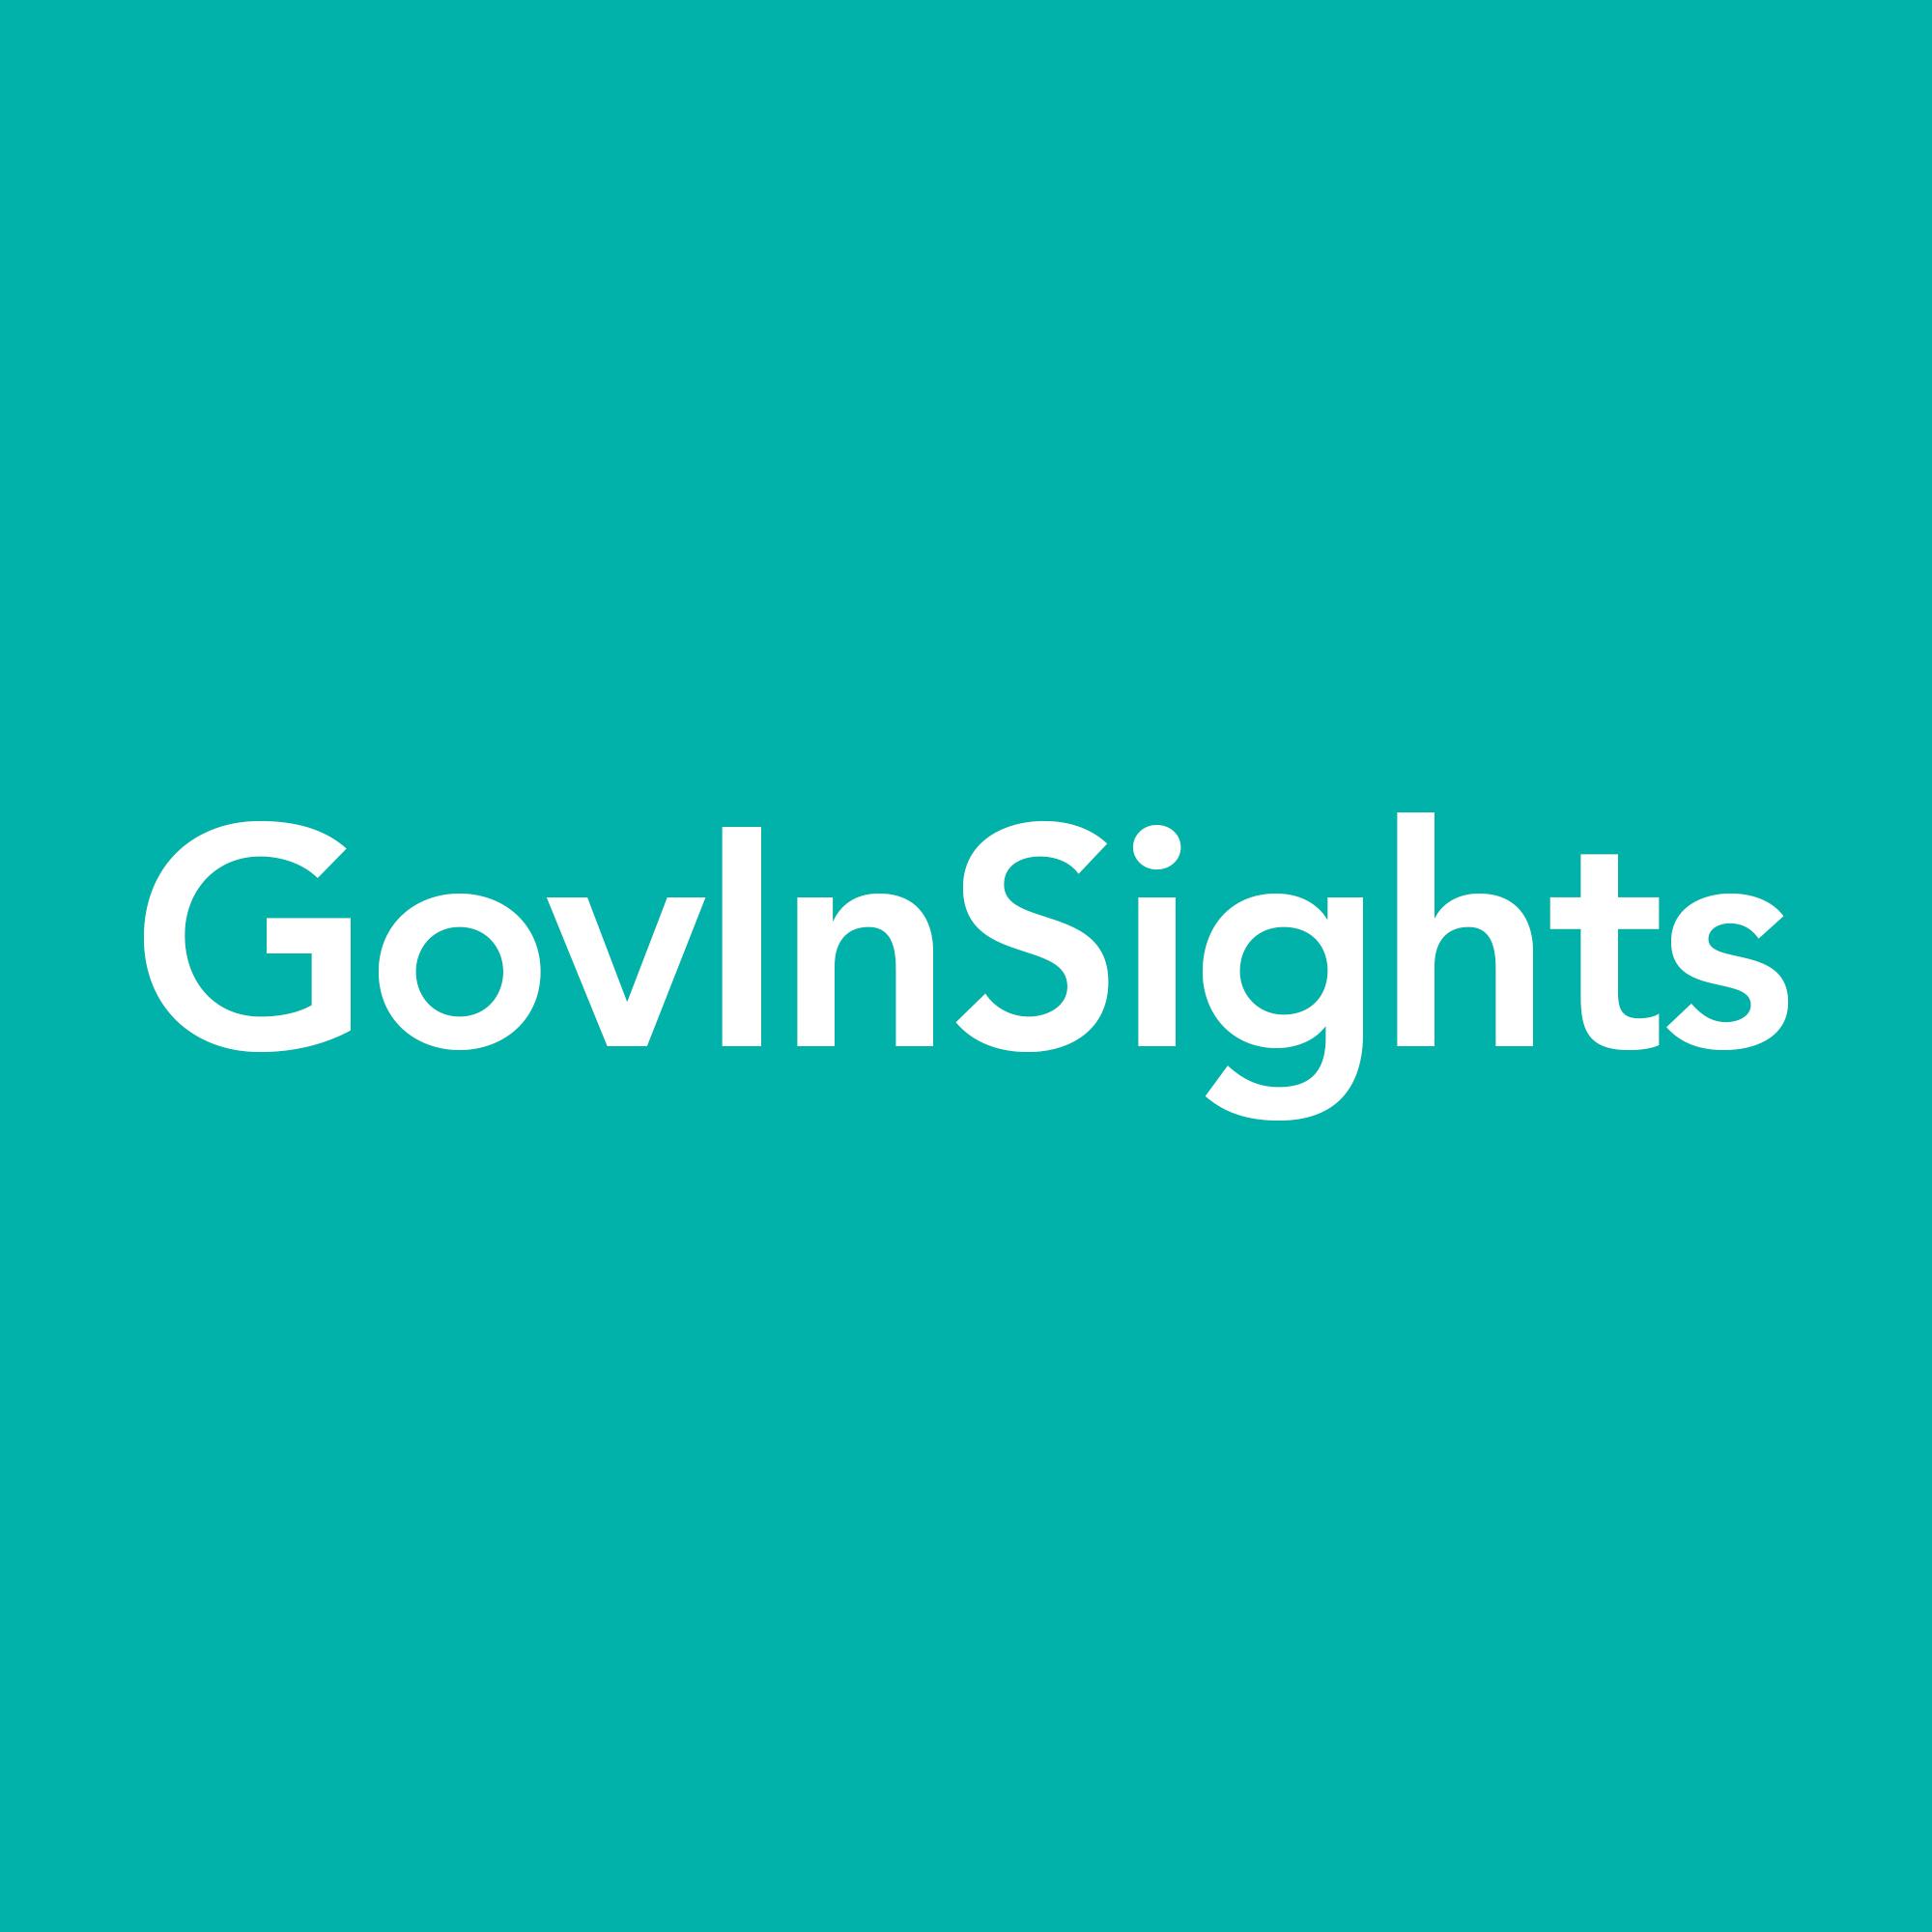 GovInSights